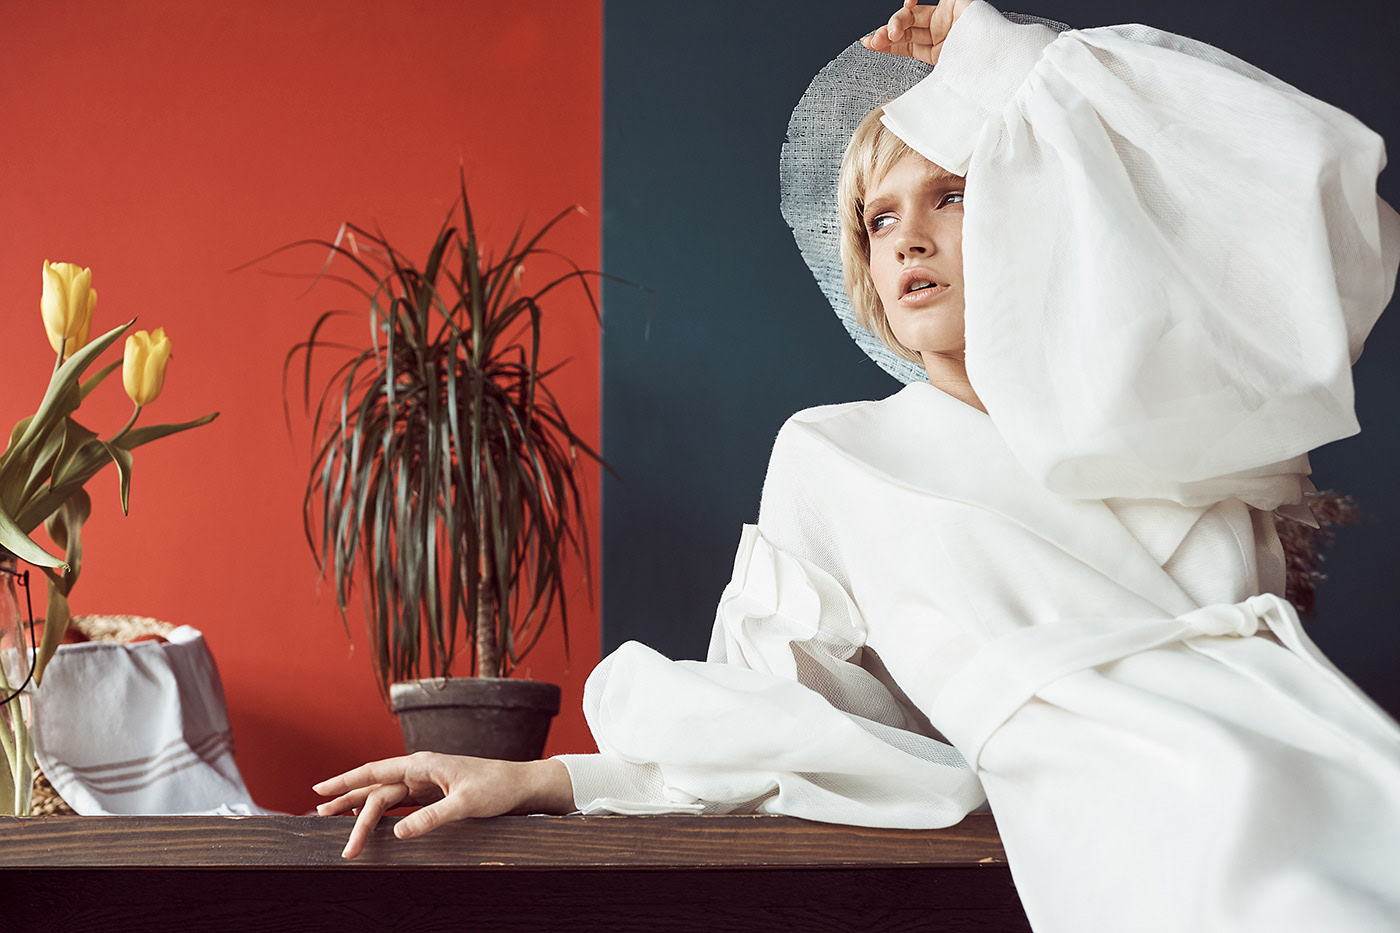 Белая колючка / фотограф Jaroslav Monchak